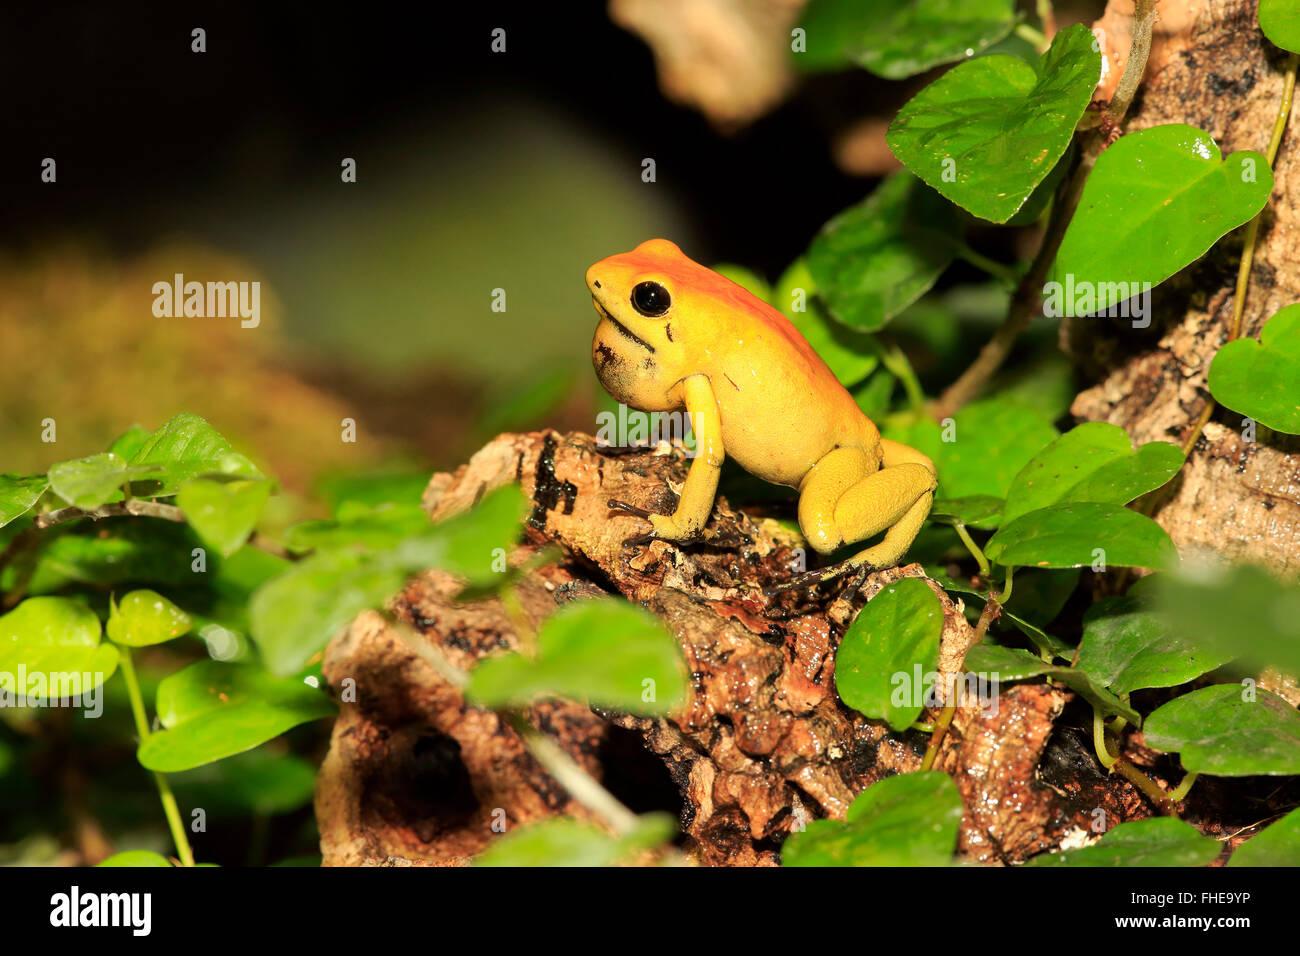 Black Legged Dart Frog, adult, South America / (Phyllobates bicolor) Stock Photo